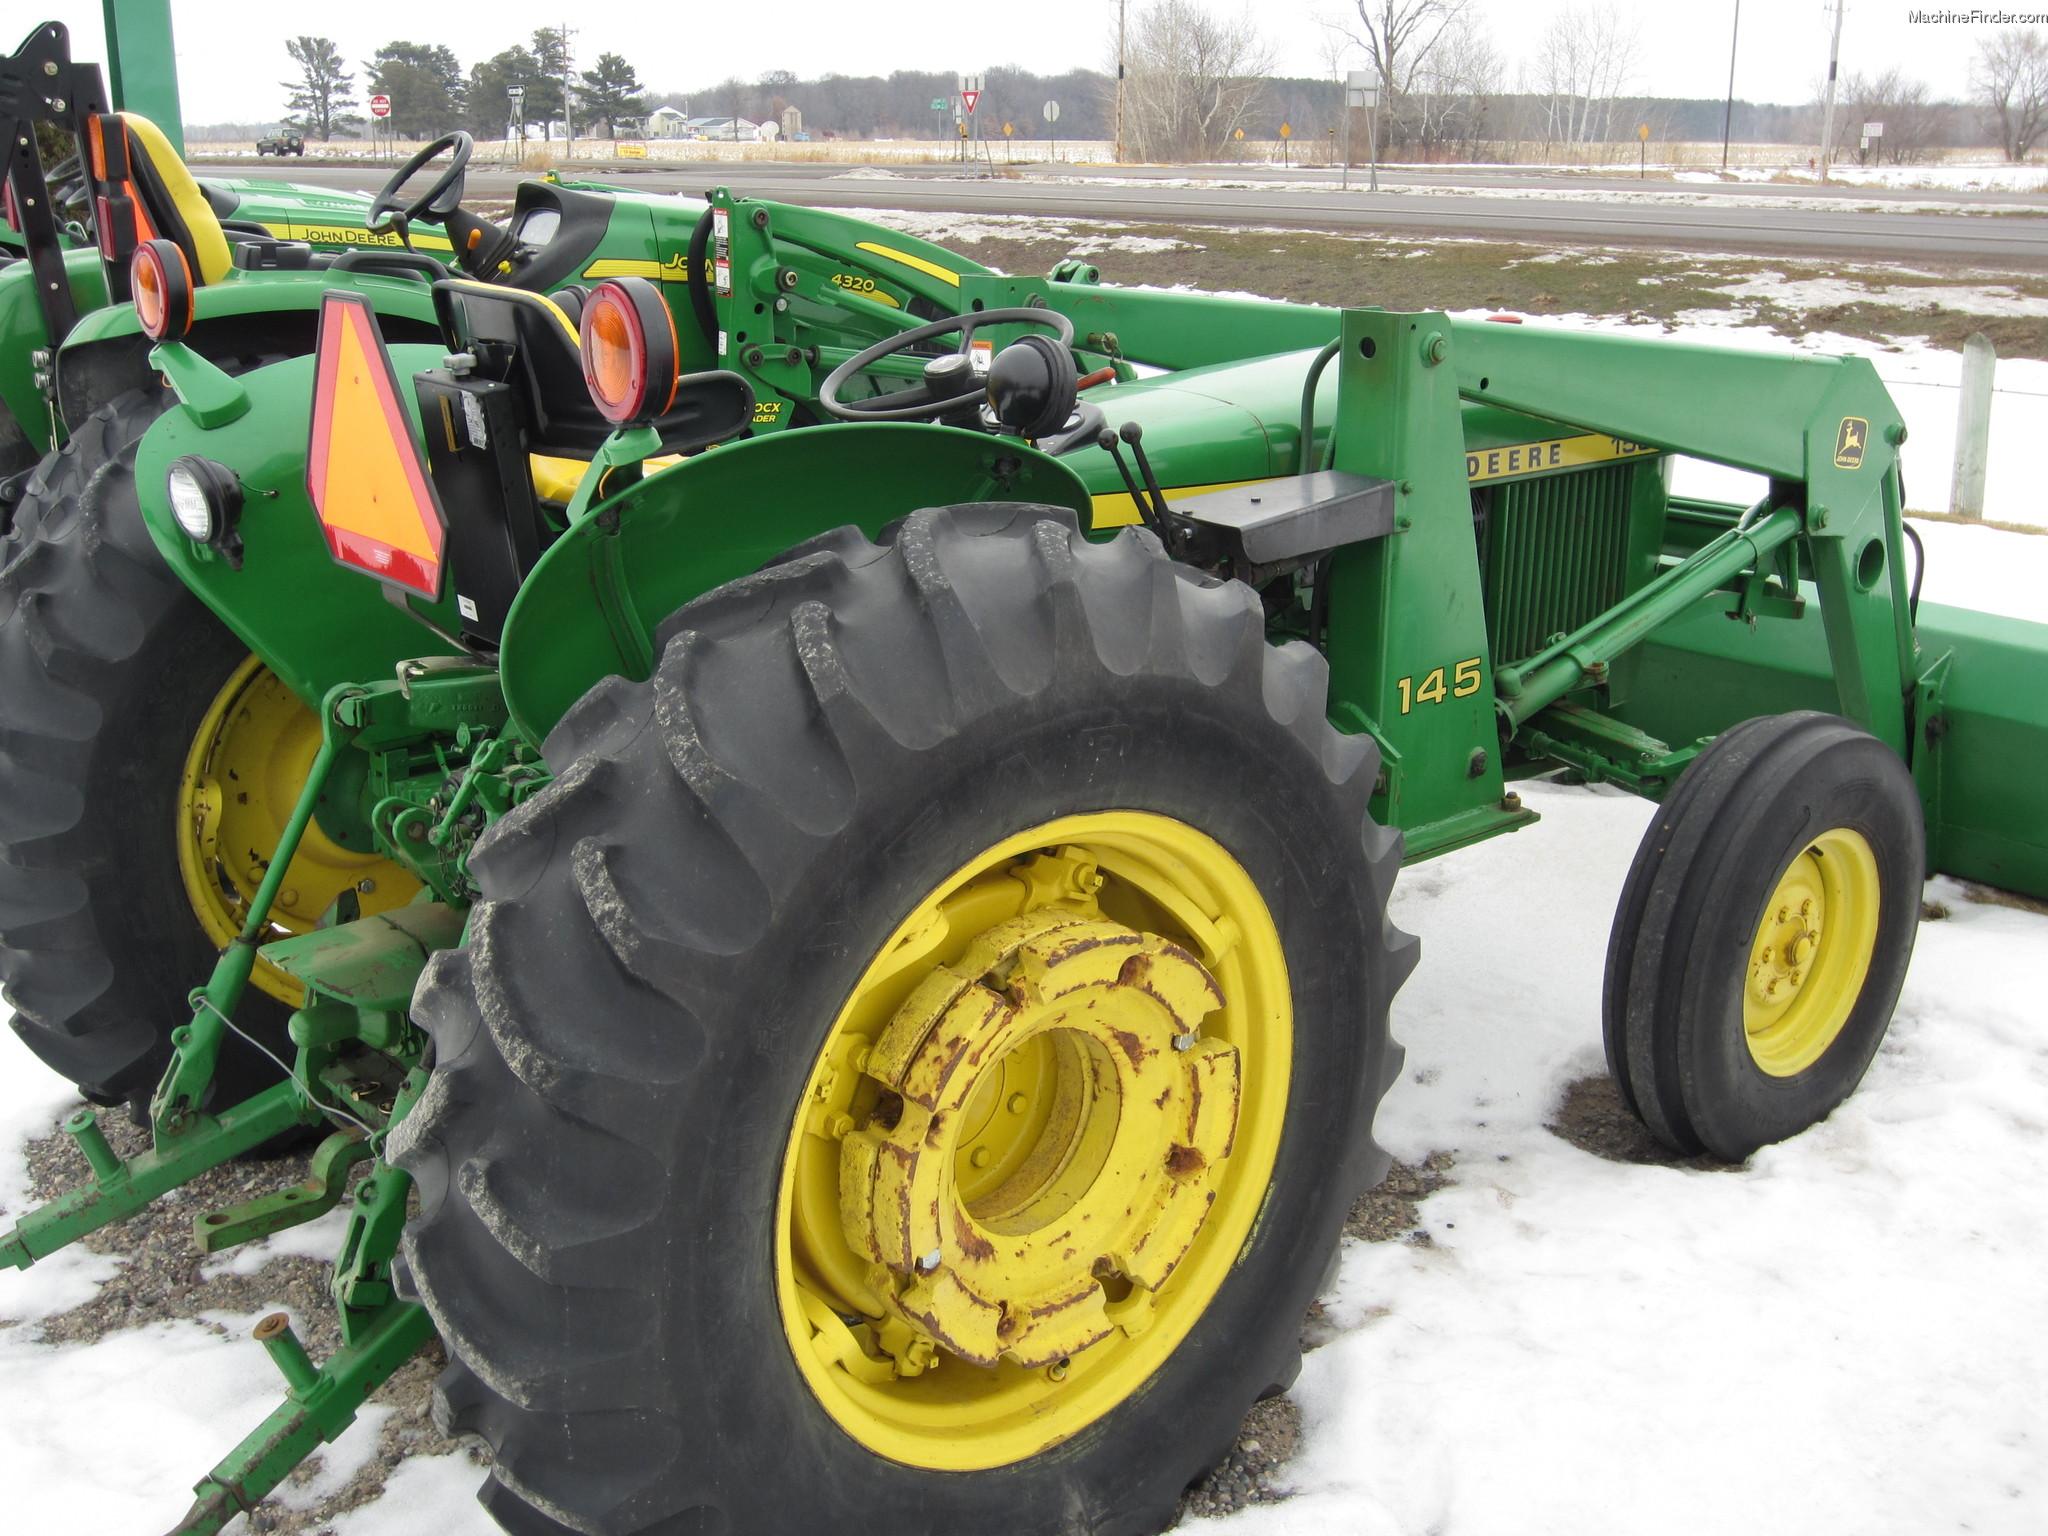 1974 John Deere 1530 Tractors - Compact (1-40hp.) - John ...